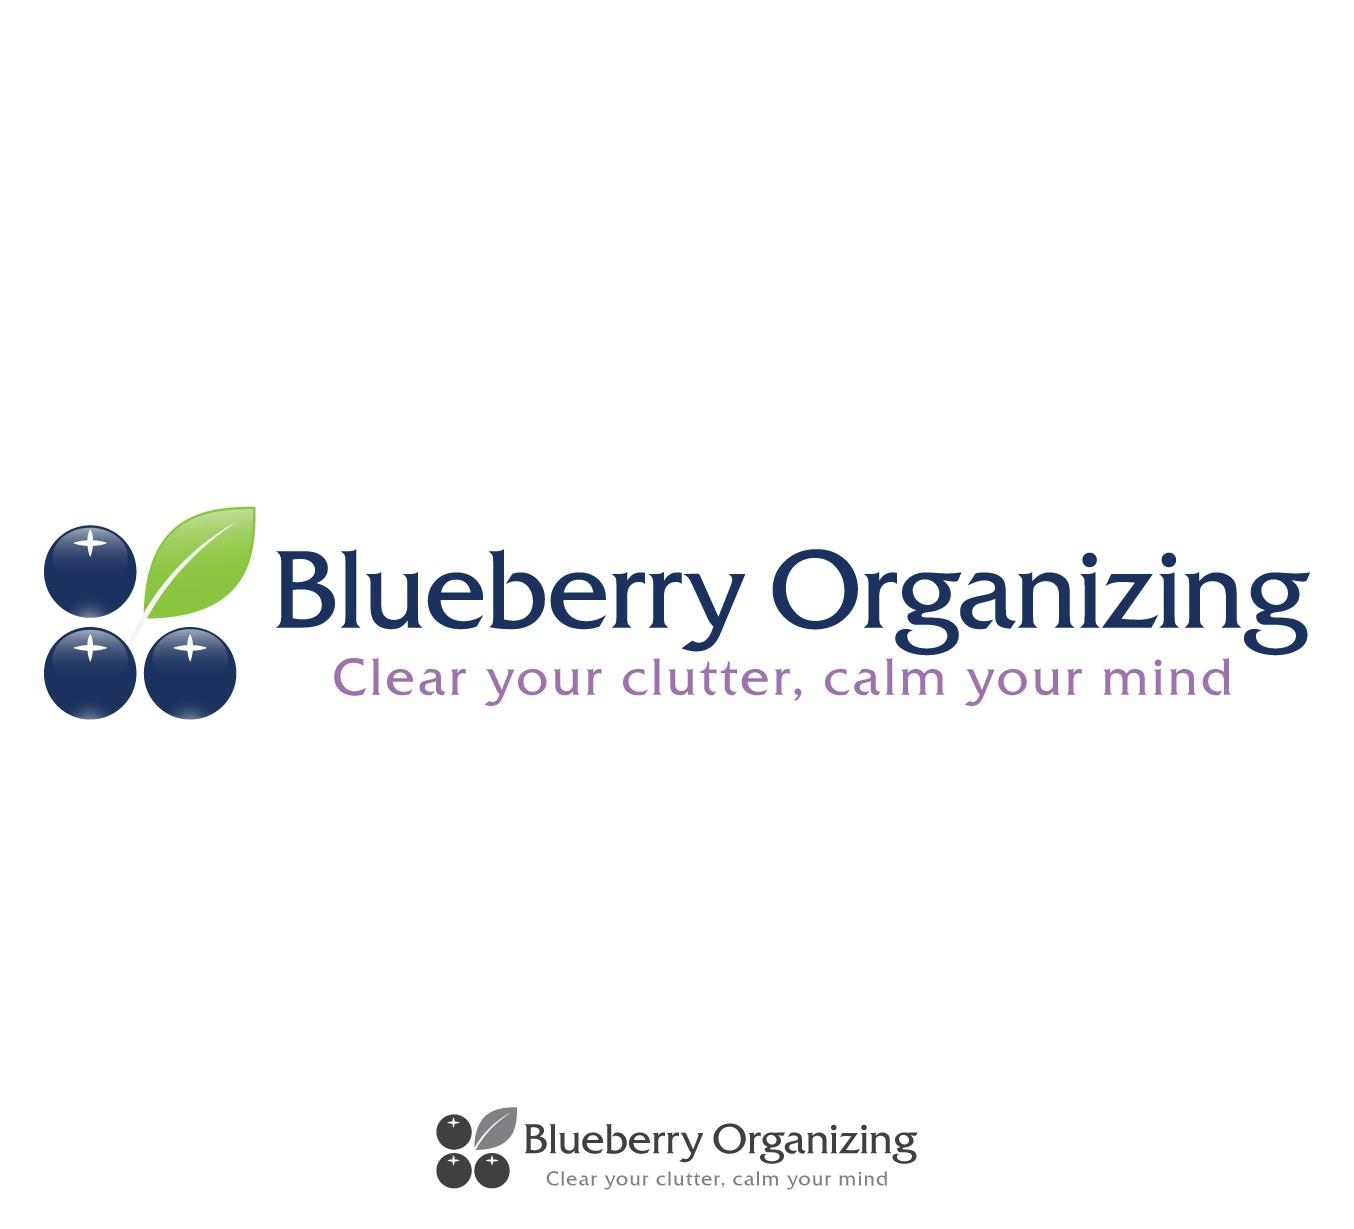 Blueberry Organizing needs a new logo